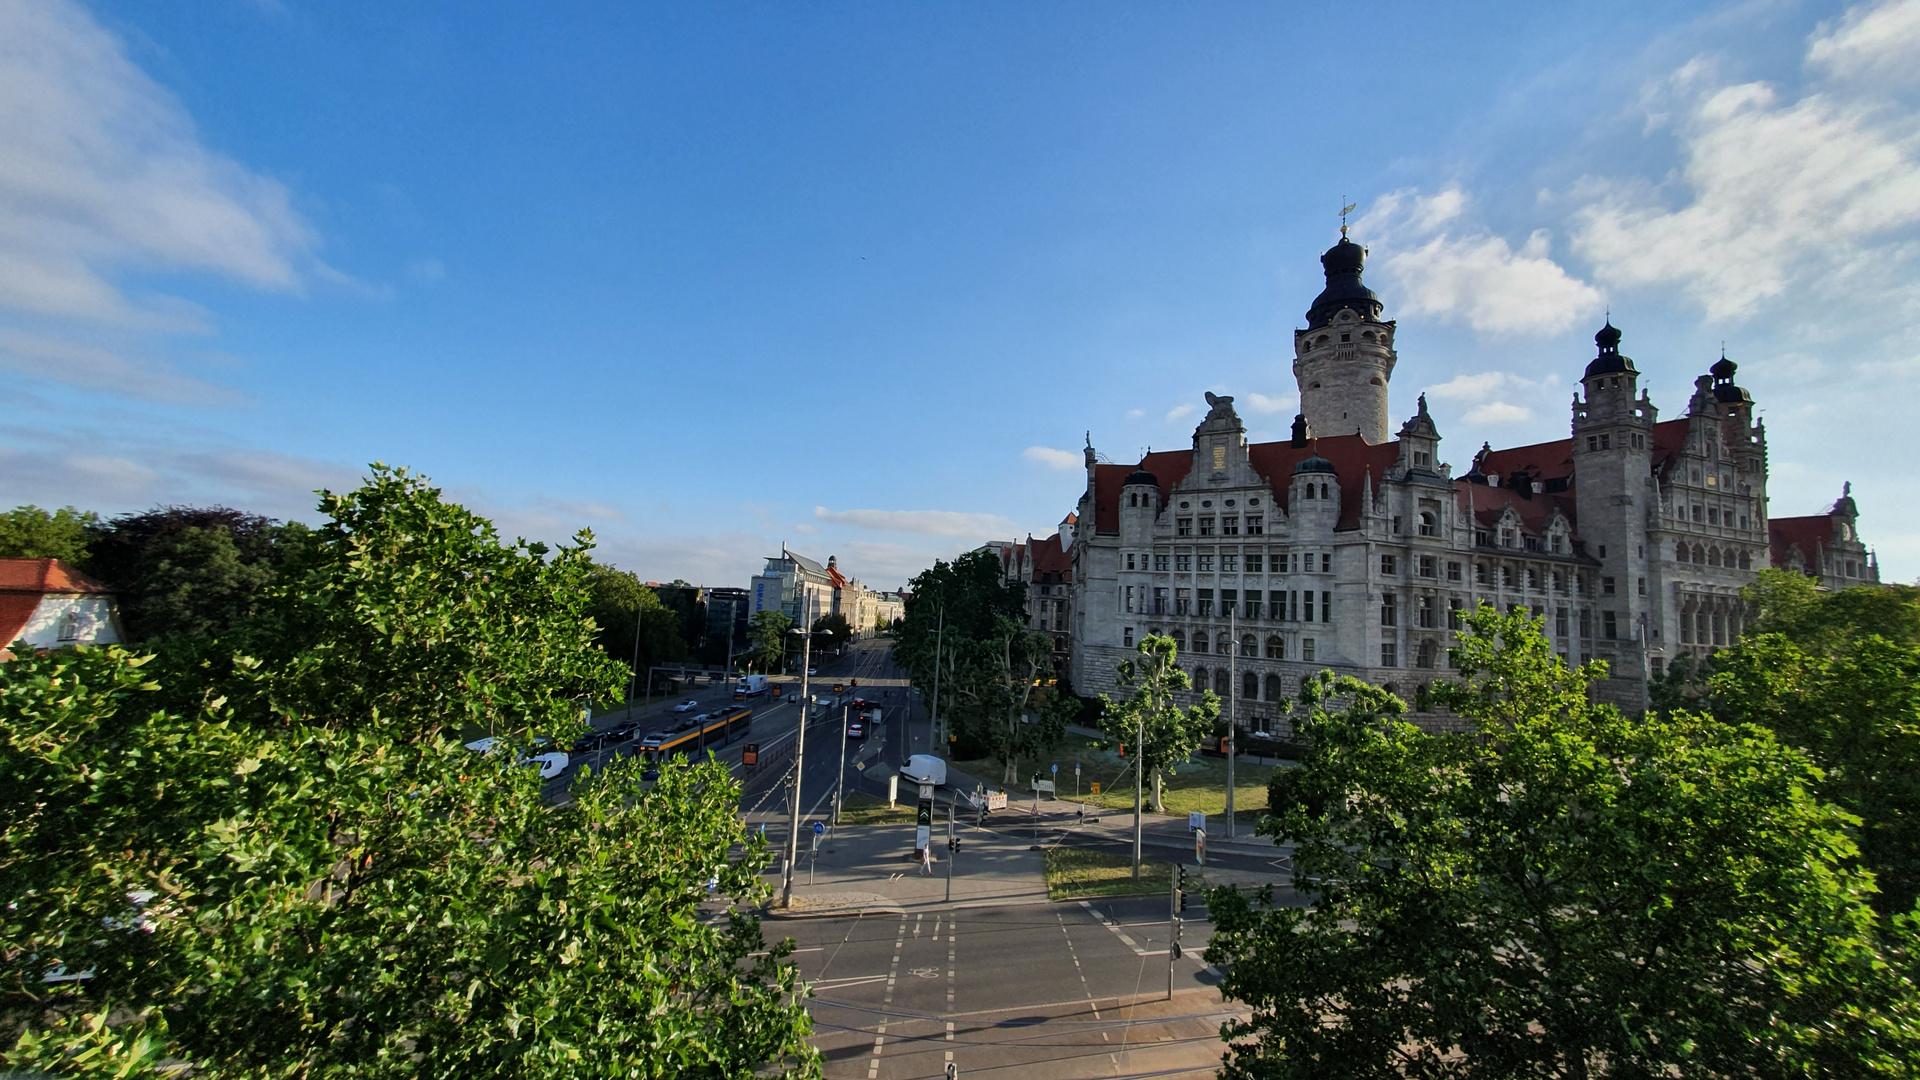 27.06.2019 Neues Rathaus